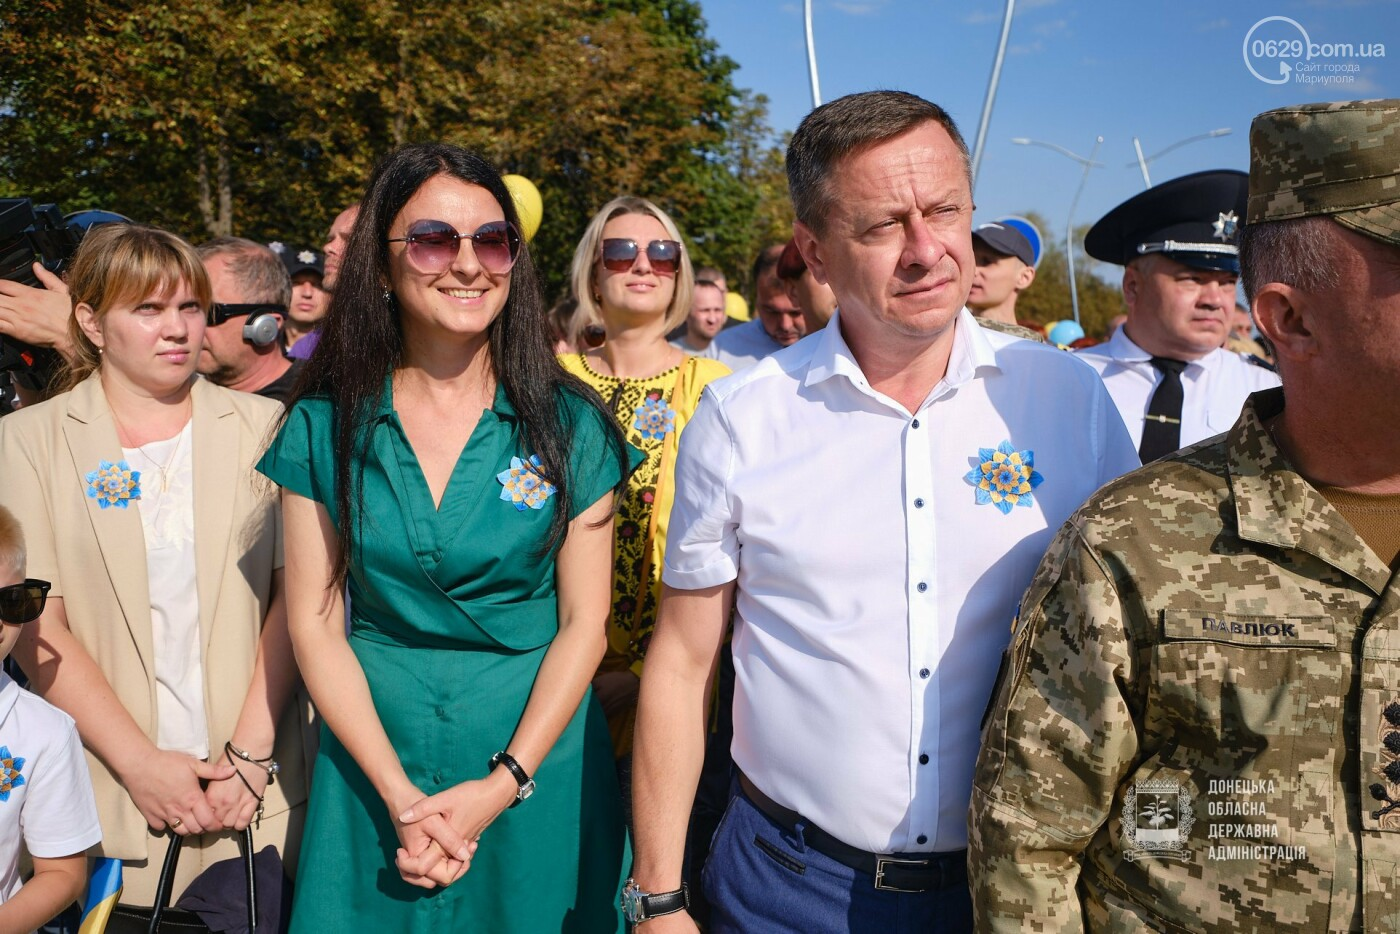 В Донецкой области подняли флаг Украины на 80 метров, - ФОТО, фото-3